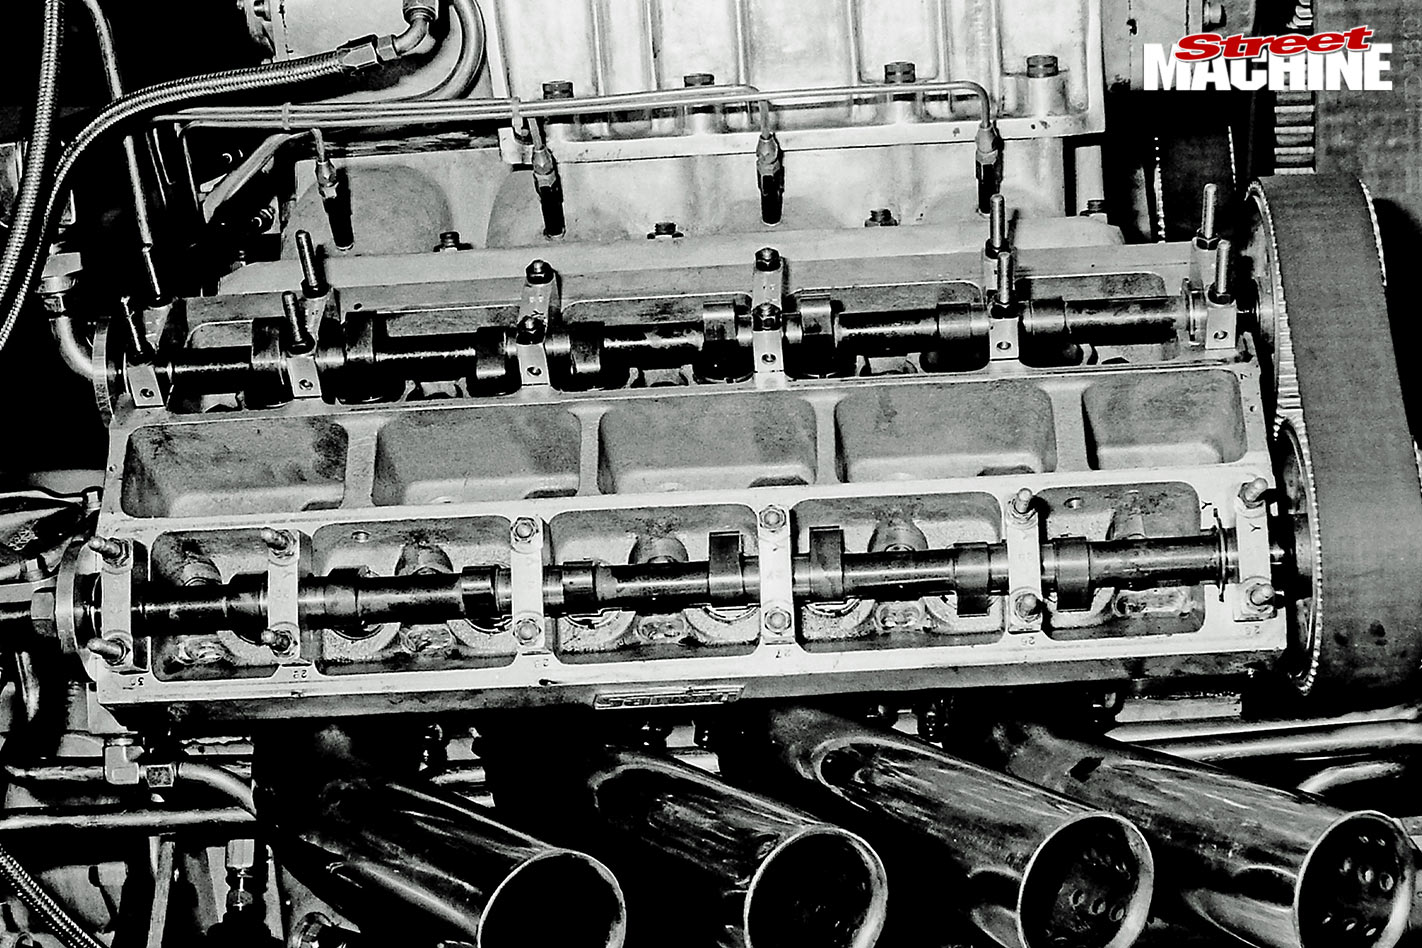 Sainty 561 cube engine